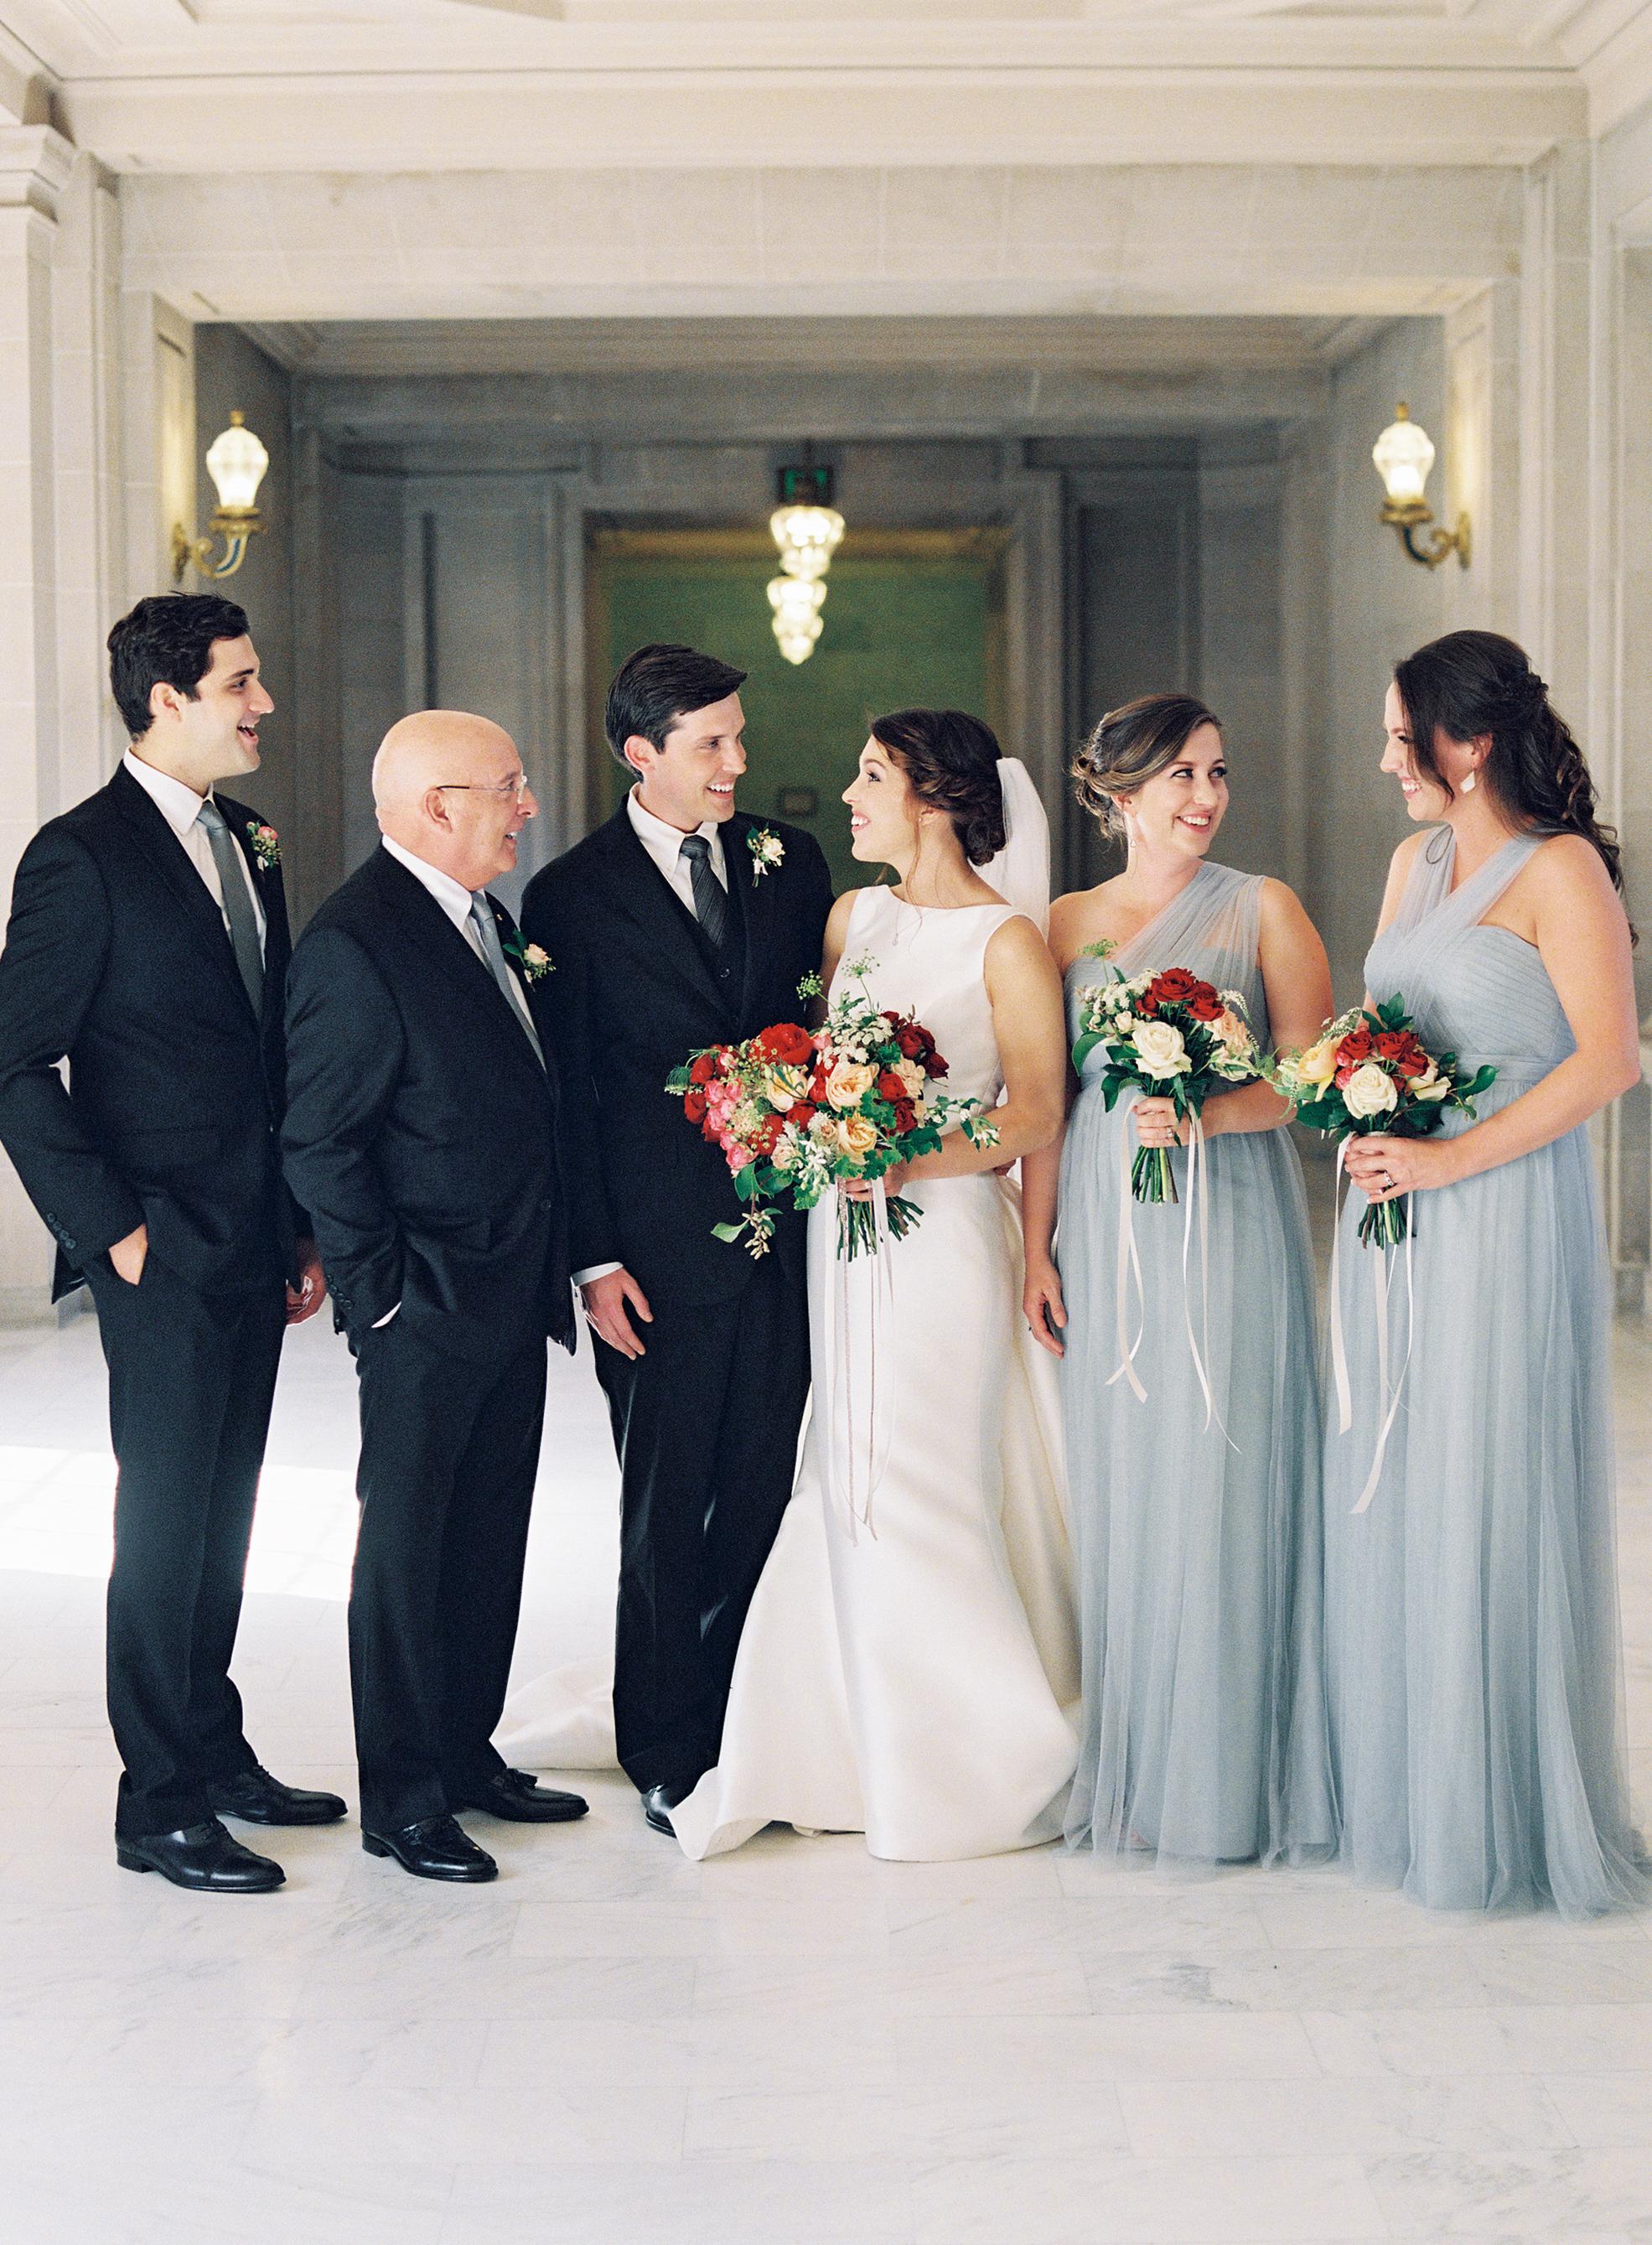 Meghan Mehan Photography - California Wedding Photographer | San Francisco City Hall Wedding 069.jpg